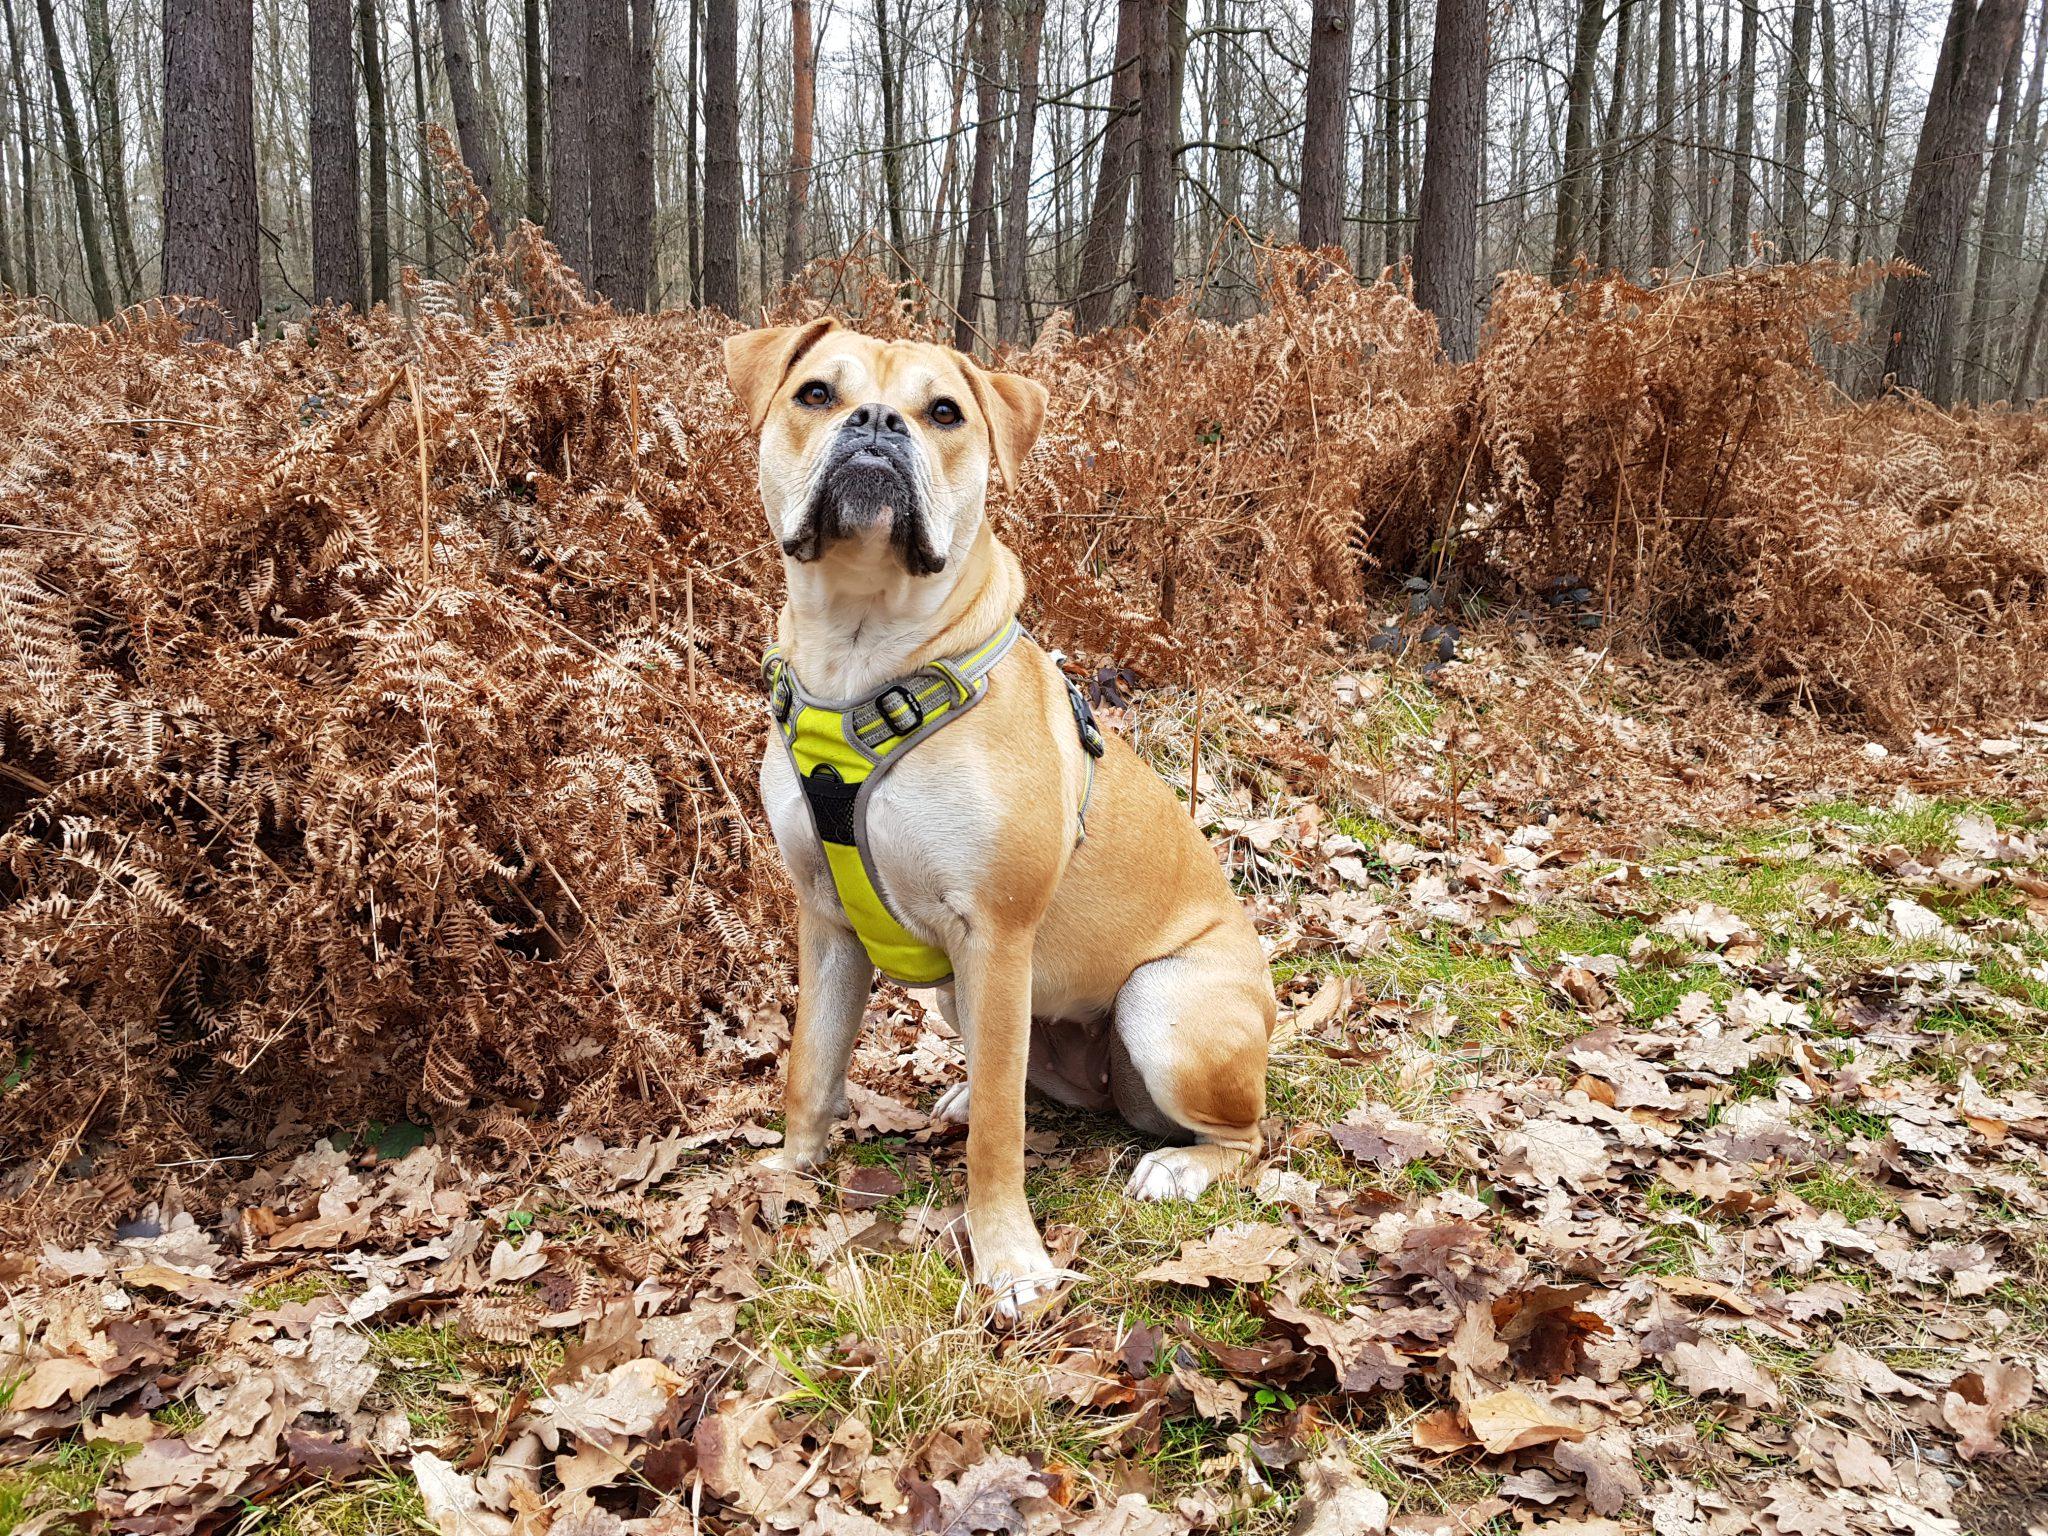 Waldspaziergang | May | Old English Bulldog Hündin | Natur | Wald | Hund | Olde English Bulldogge